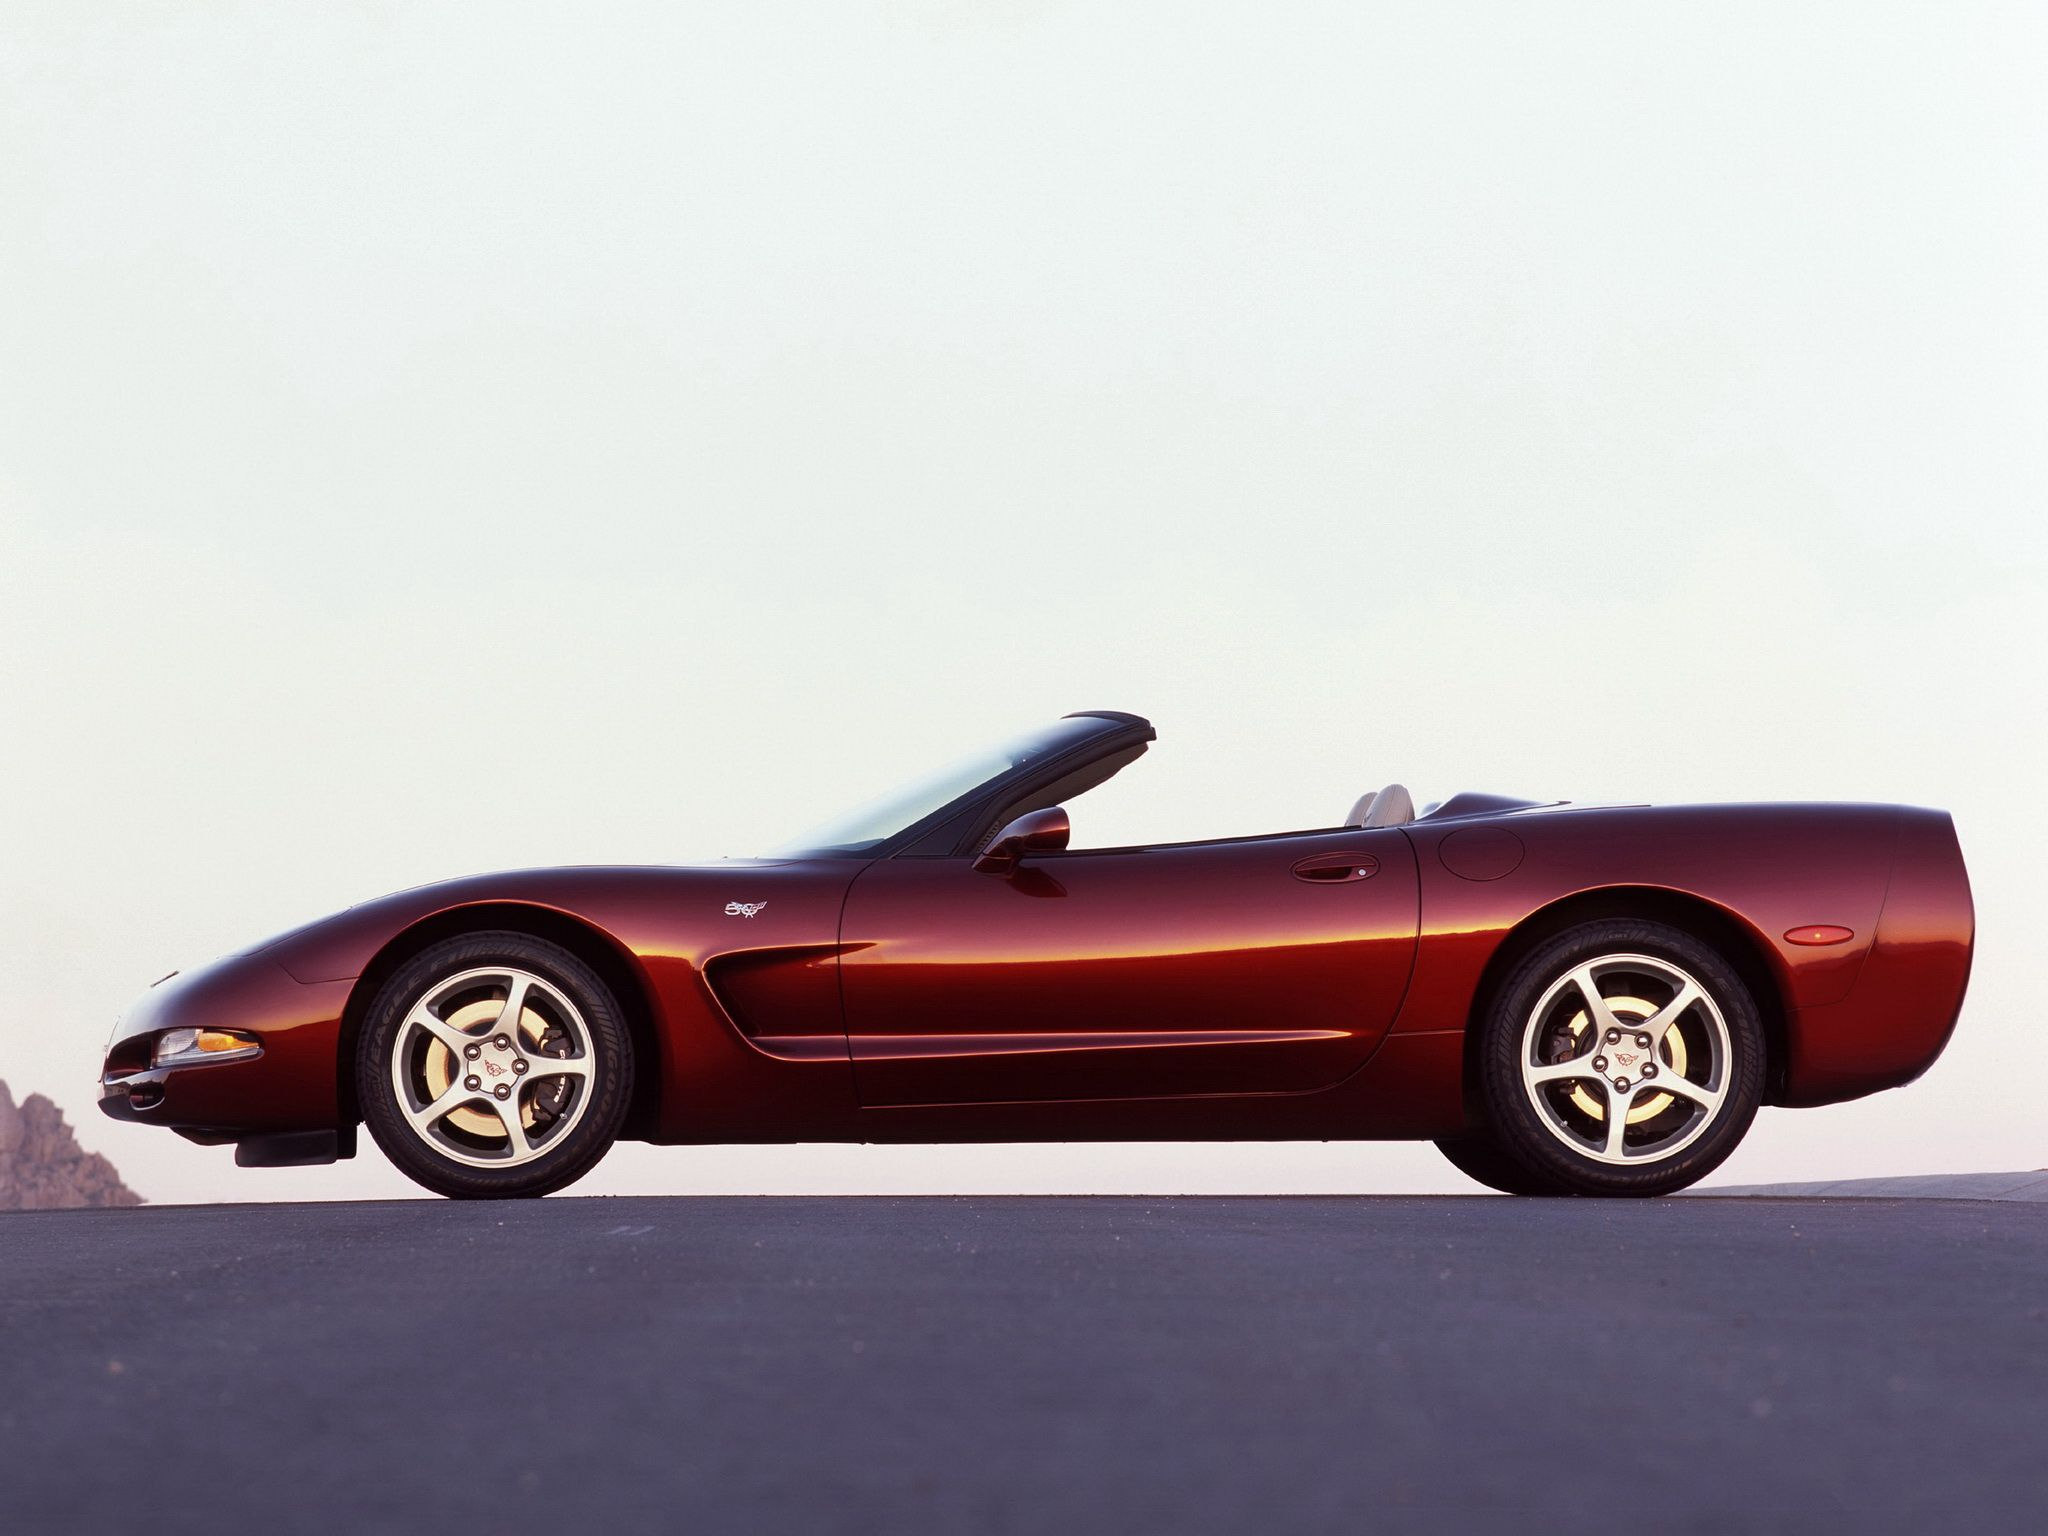 Chevrolet Corvette Convertible 50th Anniversary C5 2002 03 シボレー コルベット コルベット